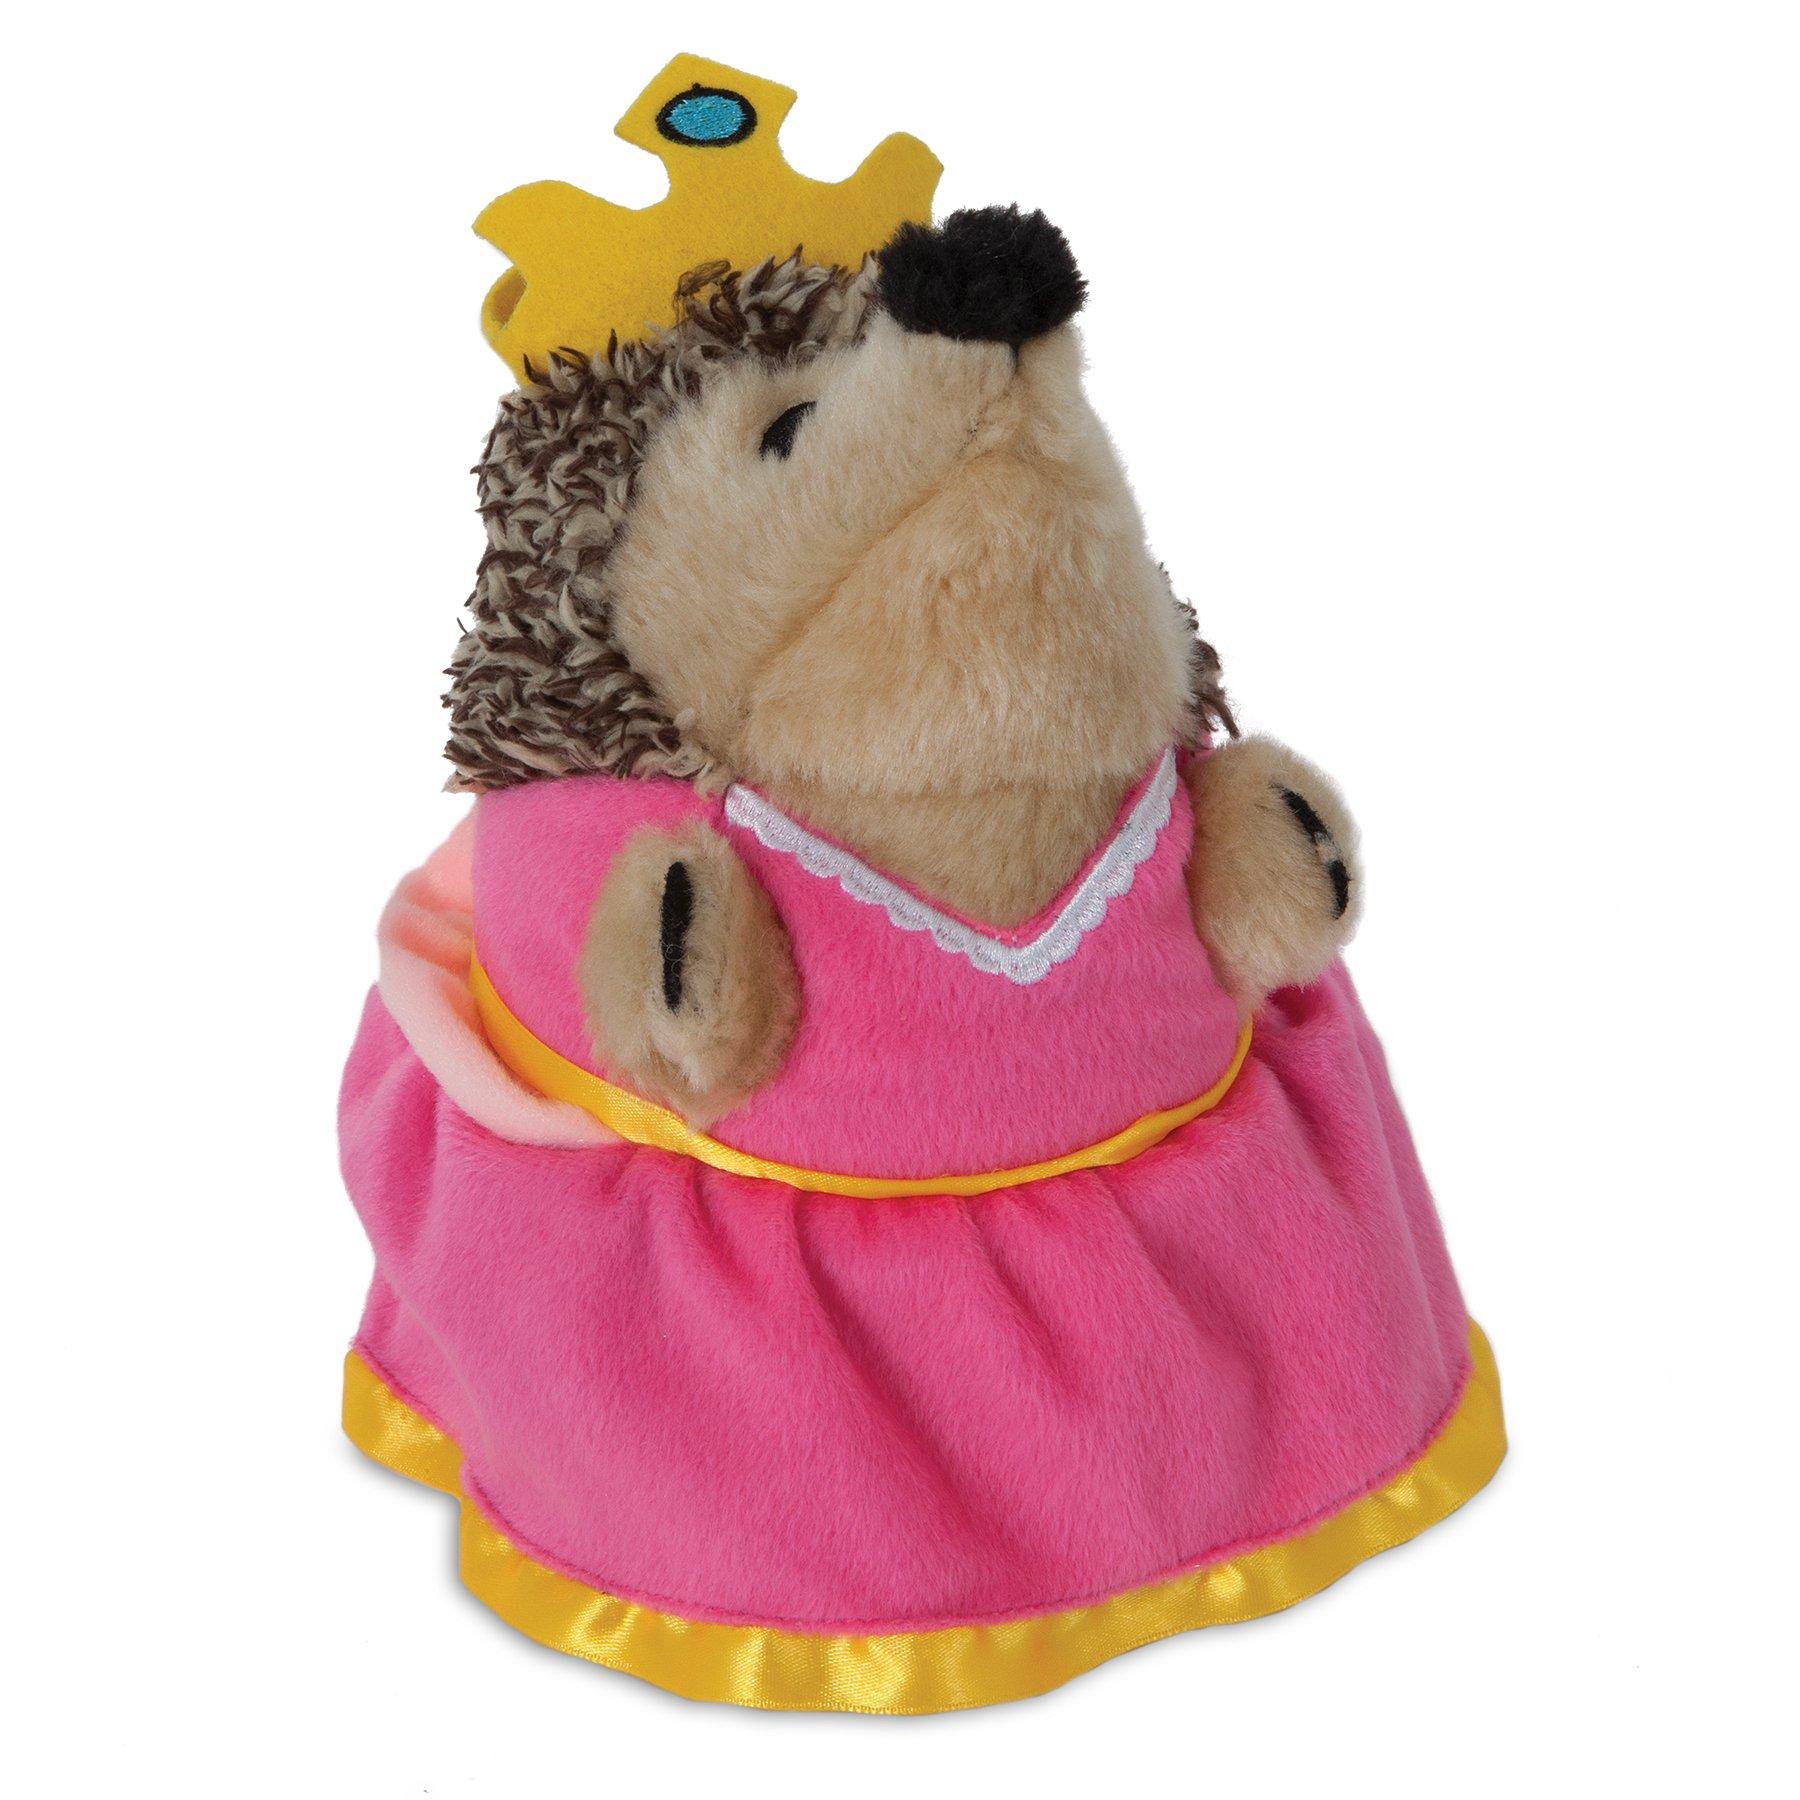 Petmate ZOOBILEE Heggie Princess Plush Toy